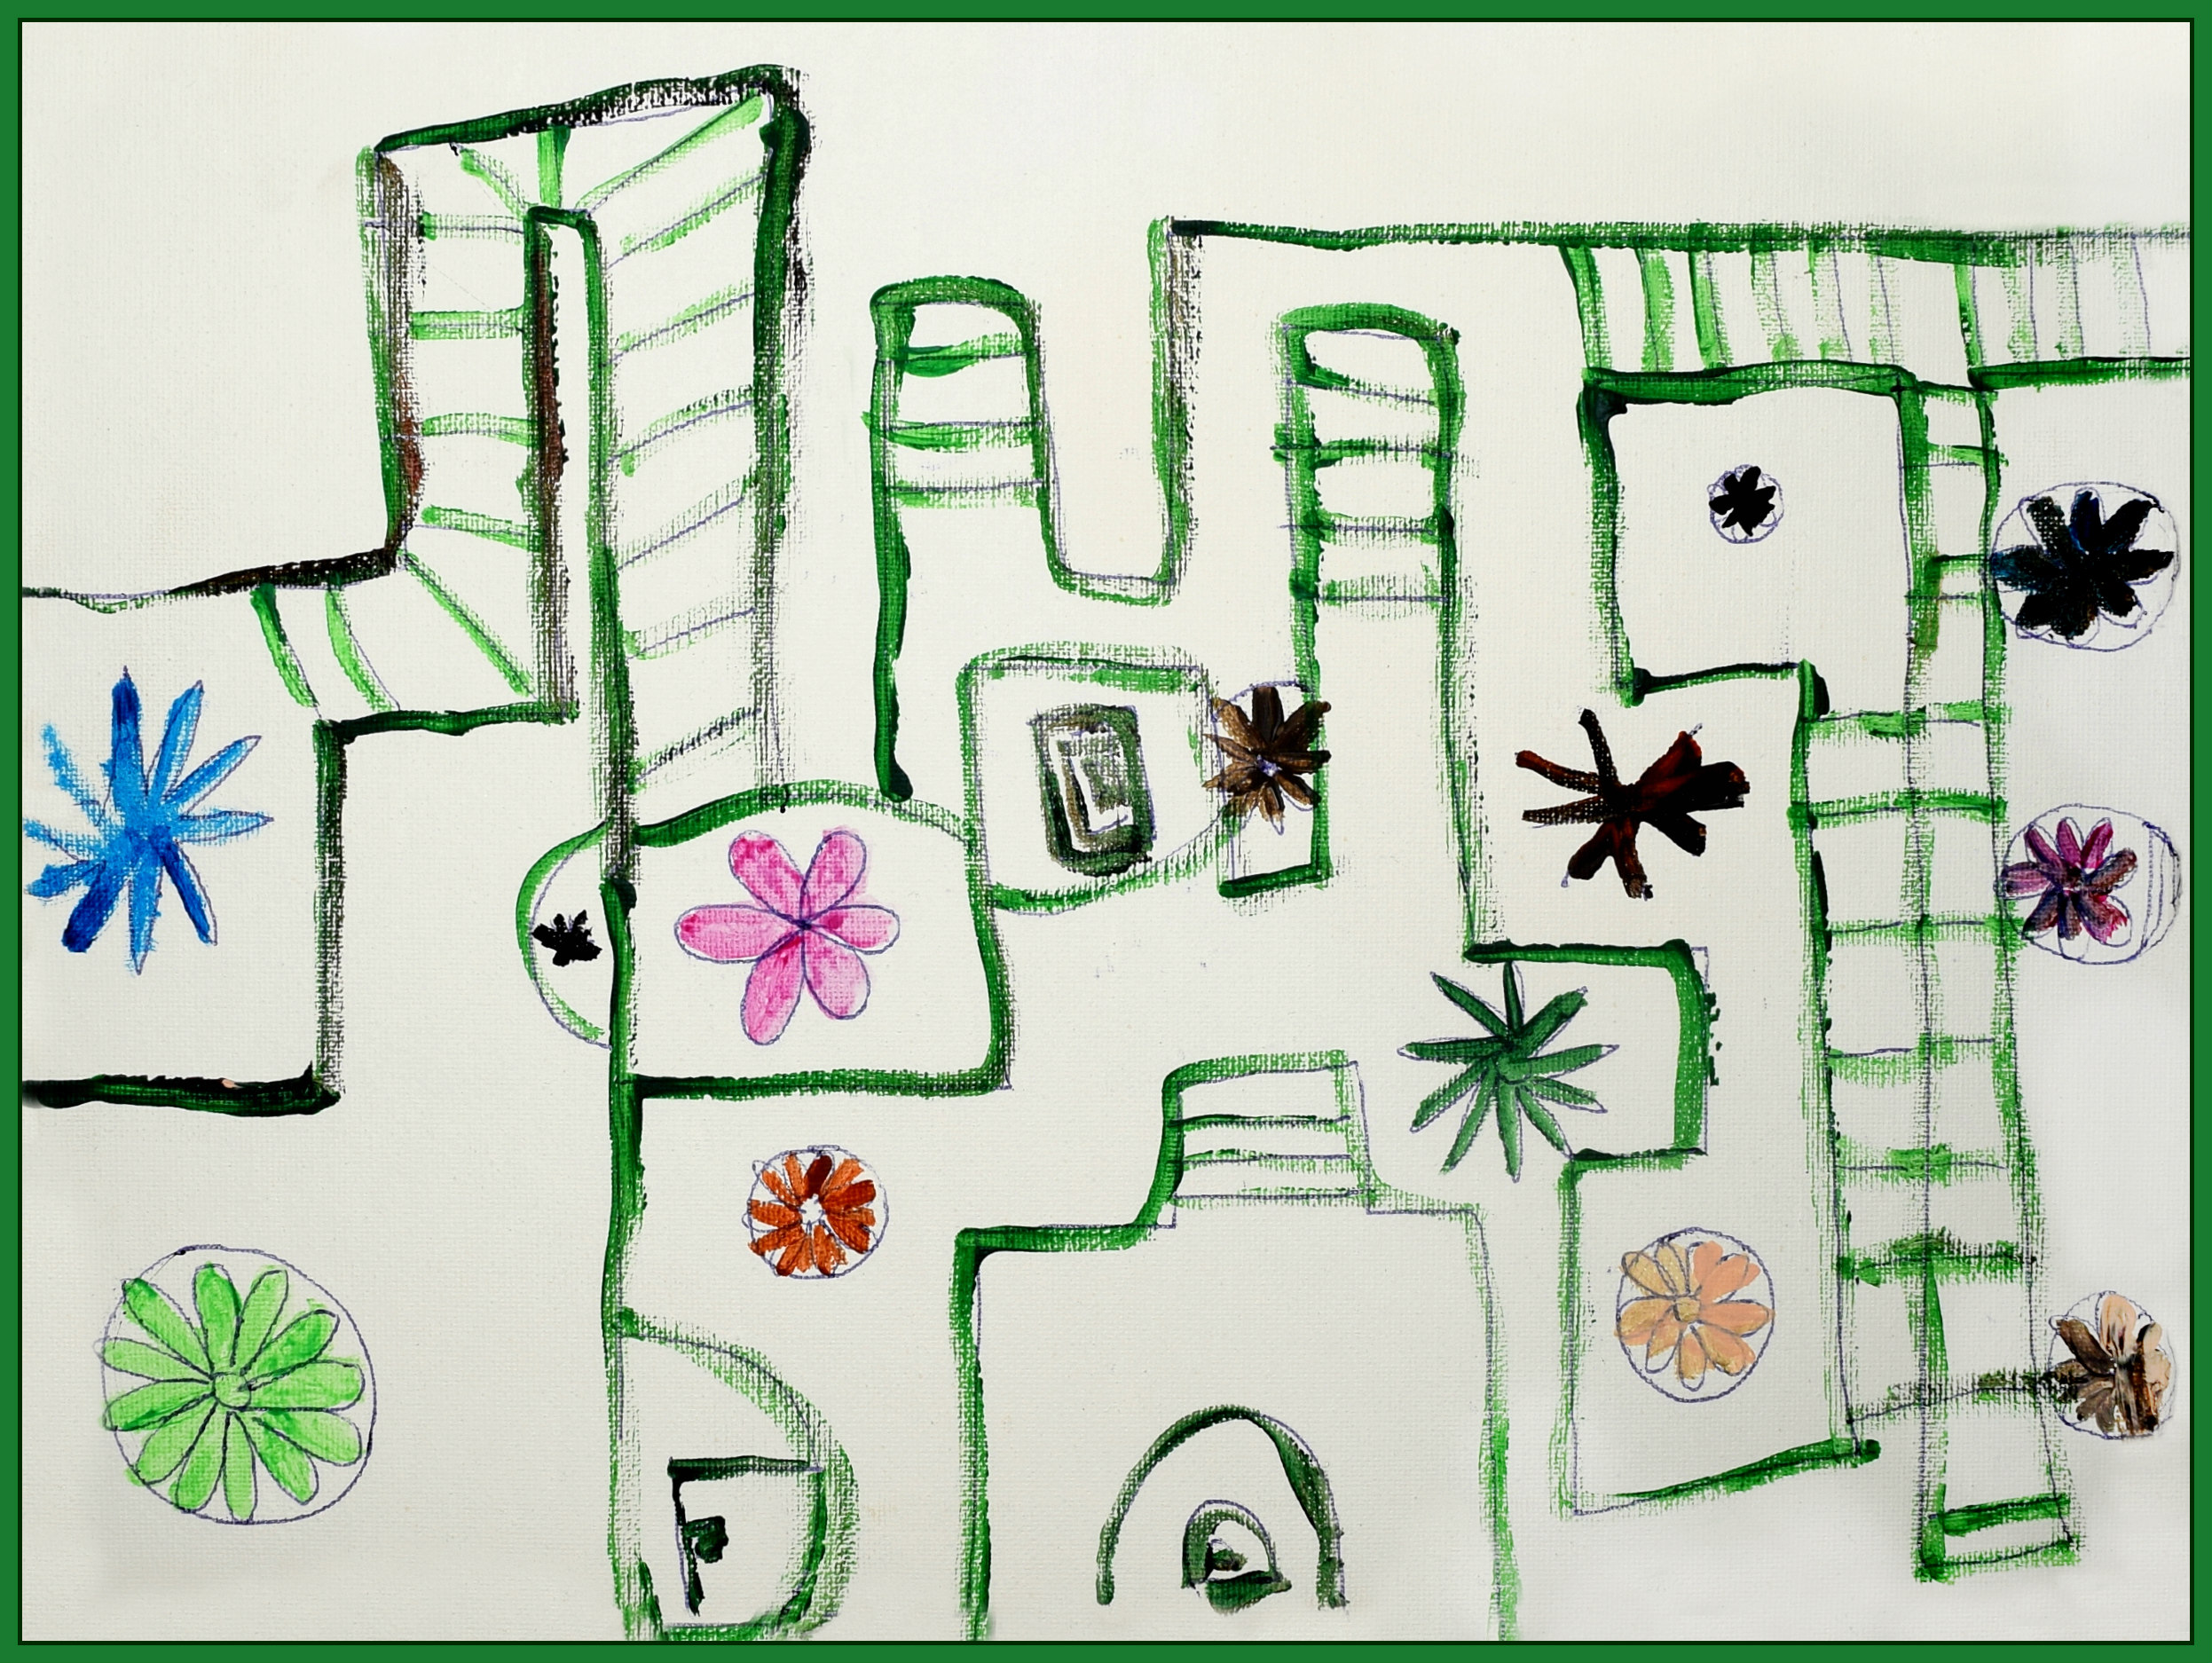 Garden Design Morgan West Markers on paper 8.5 x 11 $30